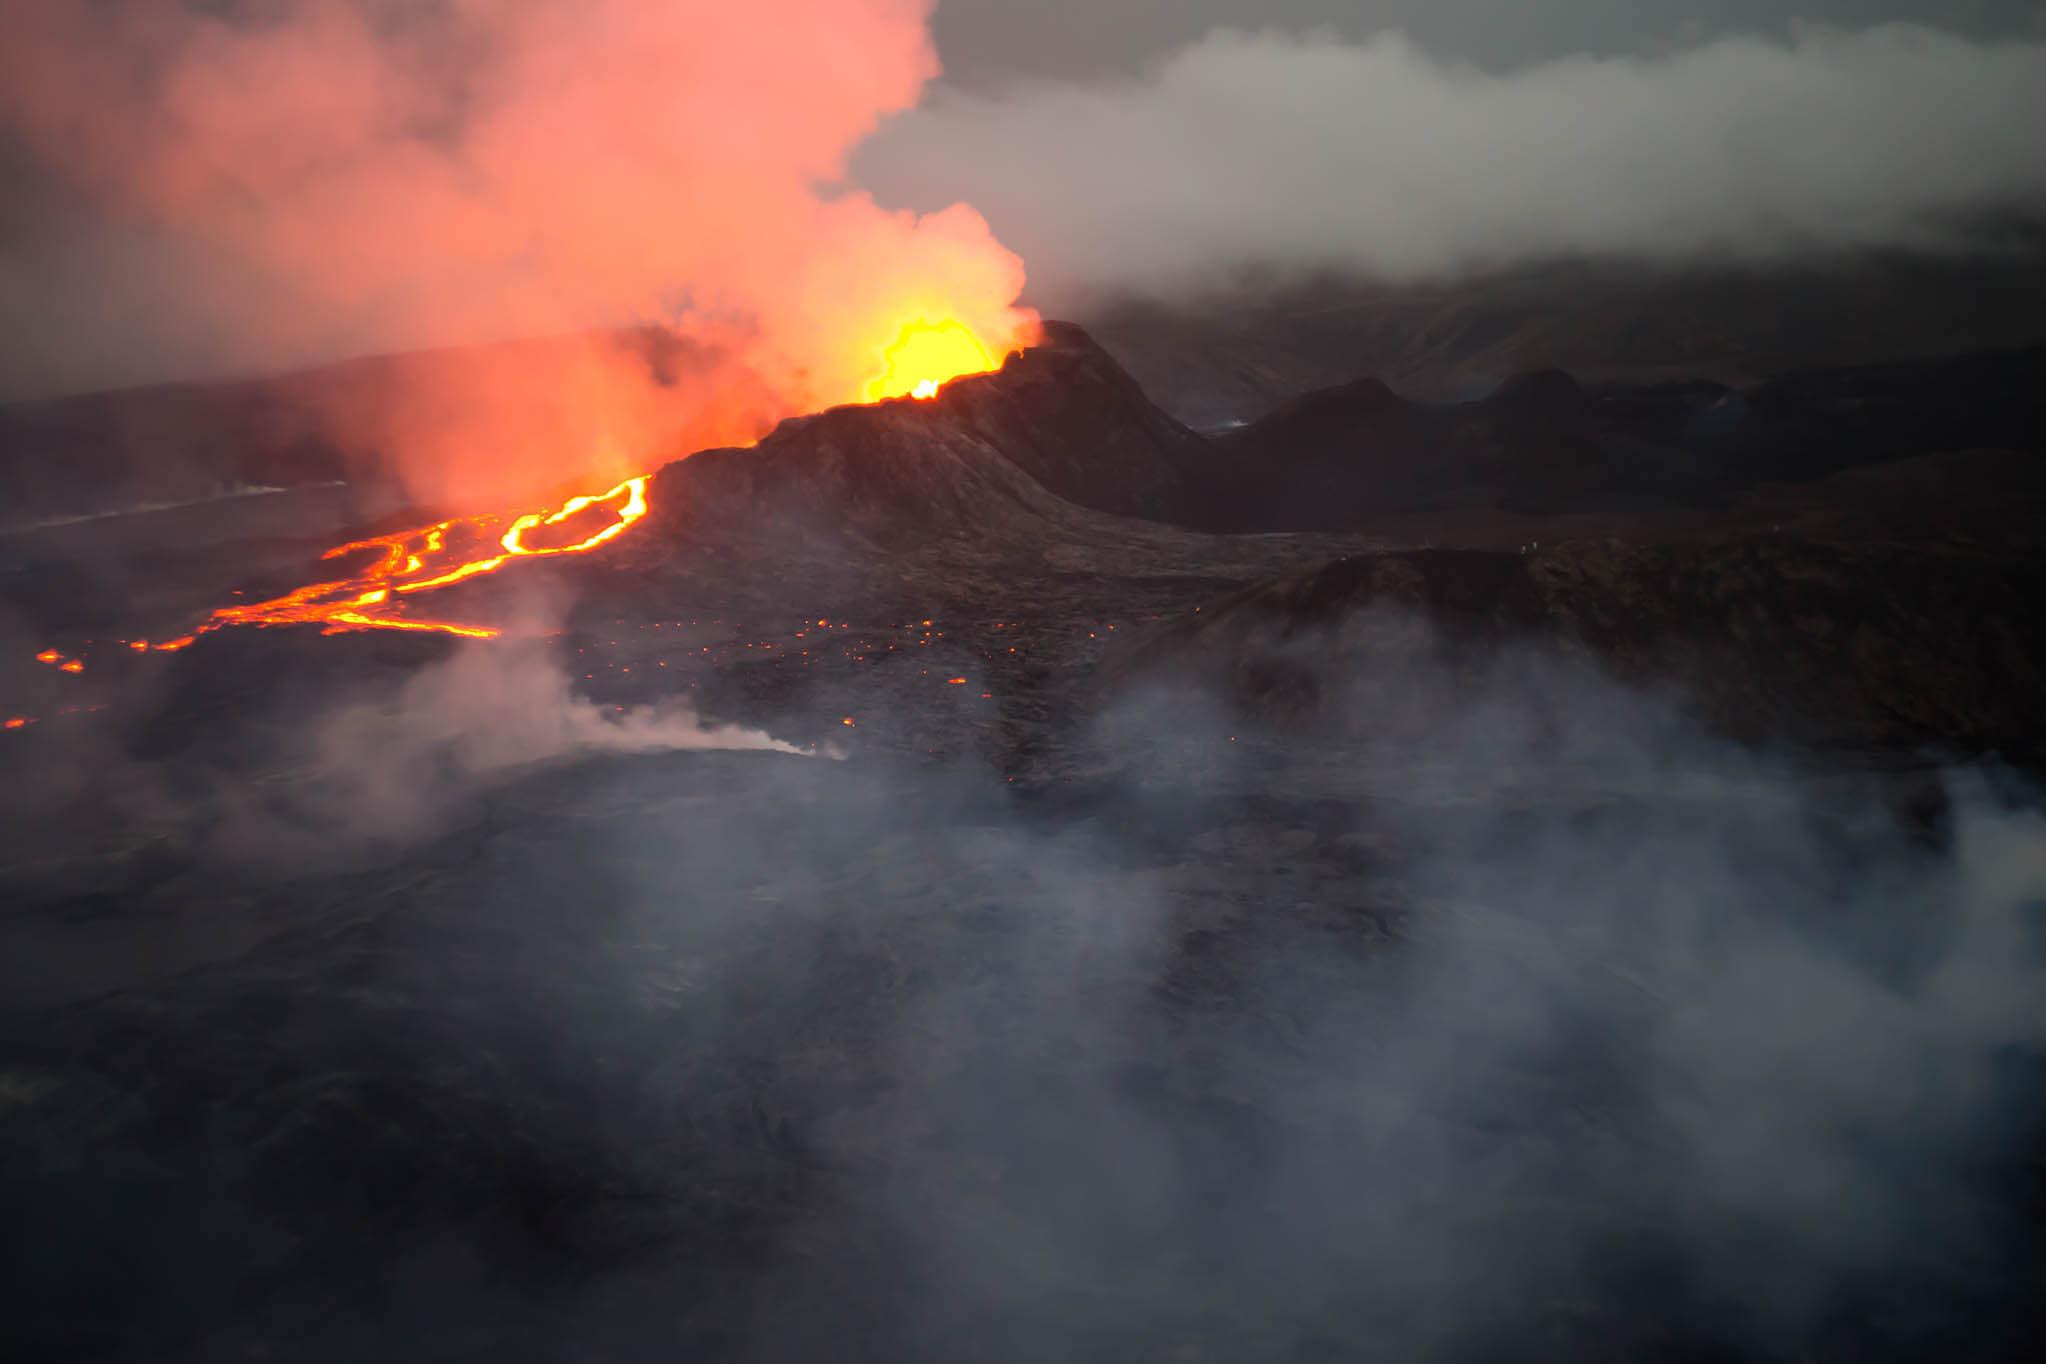 July 25, 2021. EN . Iceland : Geldingadalur / Fagradalsfjall , Chile : Nevados de Chillan , Hawaii : Mauna Loa , Mexico : Popocatepetl , Kamchatka : Karymsky .